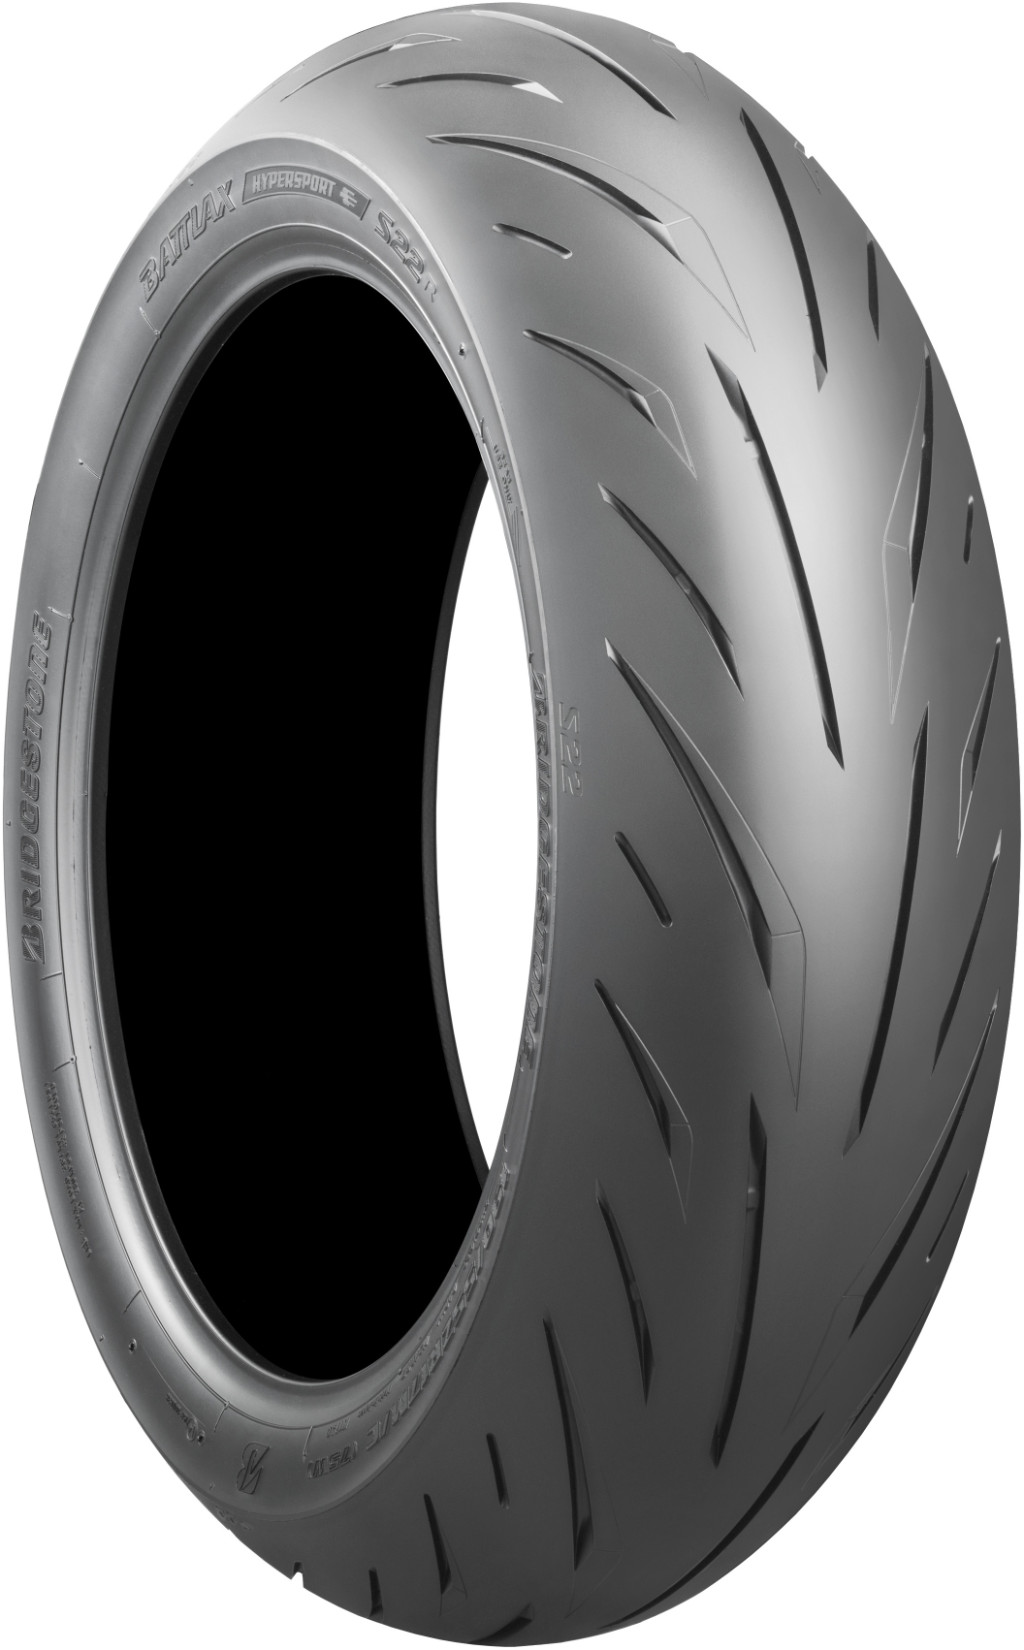 BRIDGESTONE ブリヂストンBATTLAX HYPER SPORT S22【190/50ZR17M/C(73W)】バトラックス ハイパースポーツ タイヤ